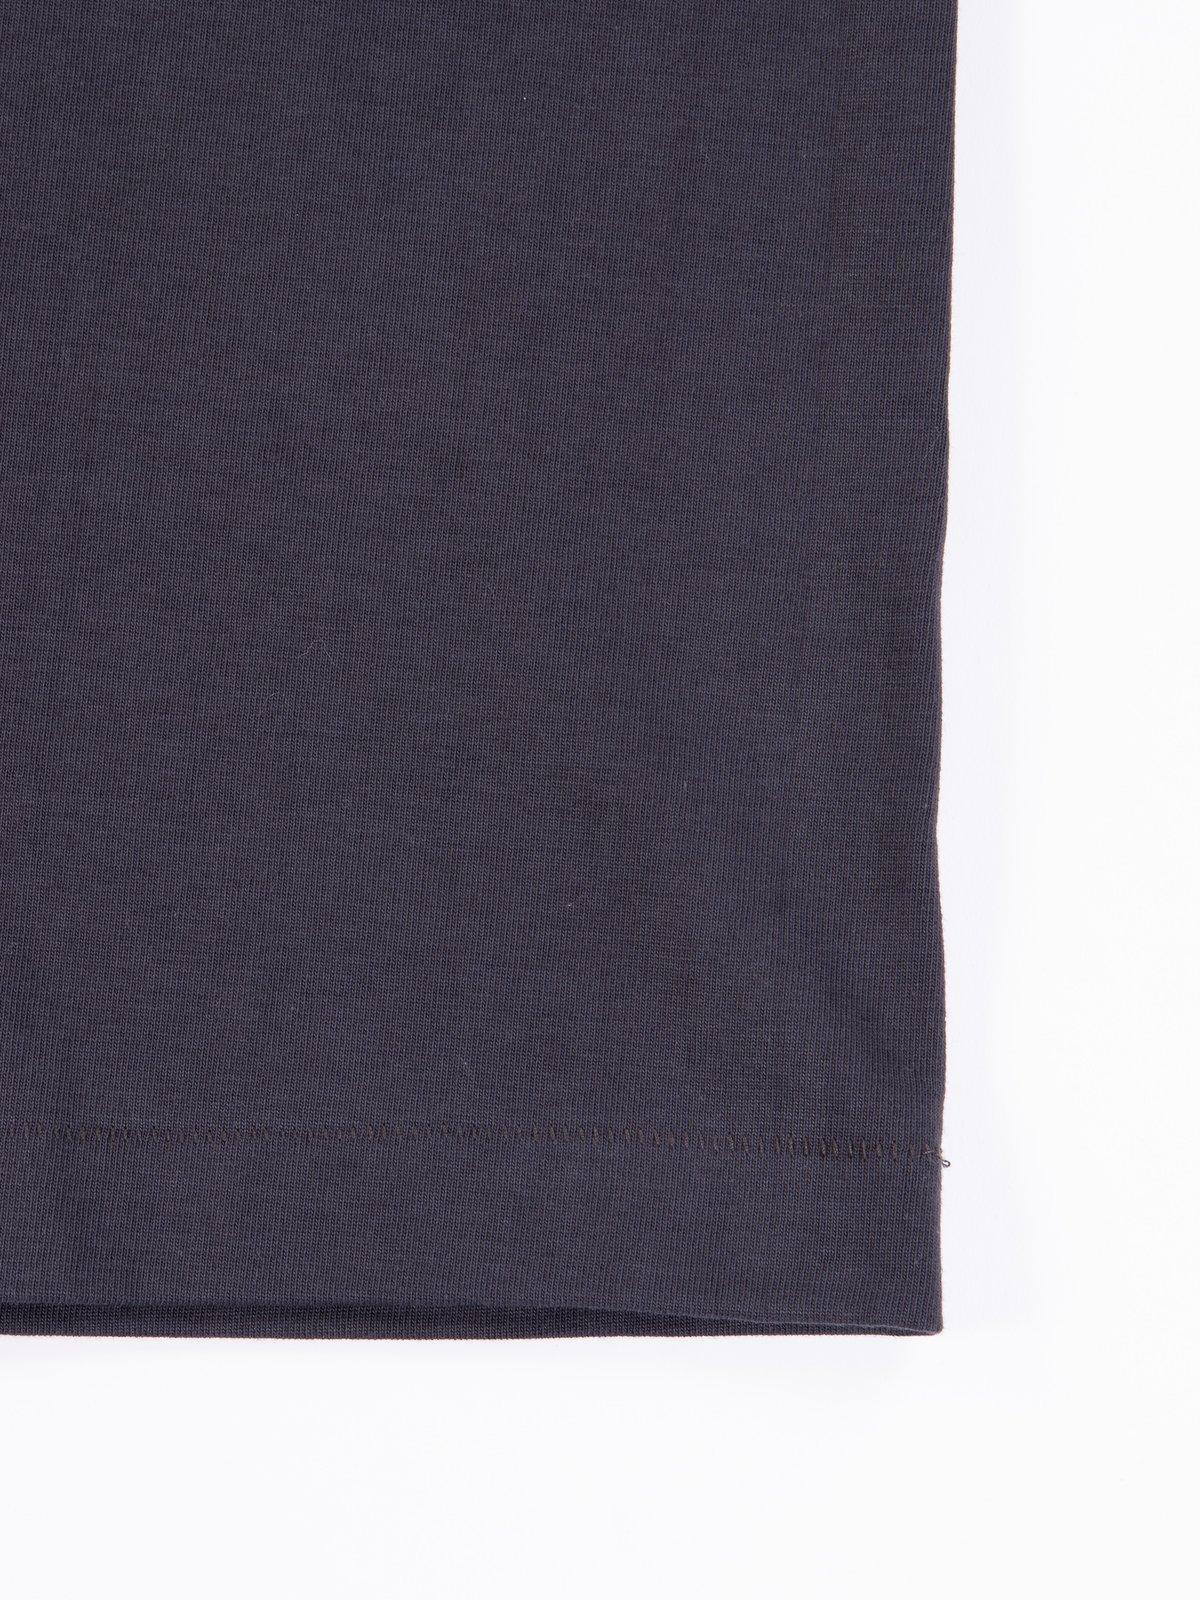 Slate 214 Organic Cotton Rundhals Shirt - Image 5